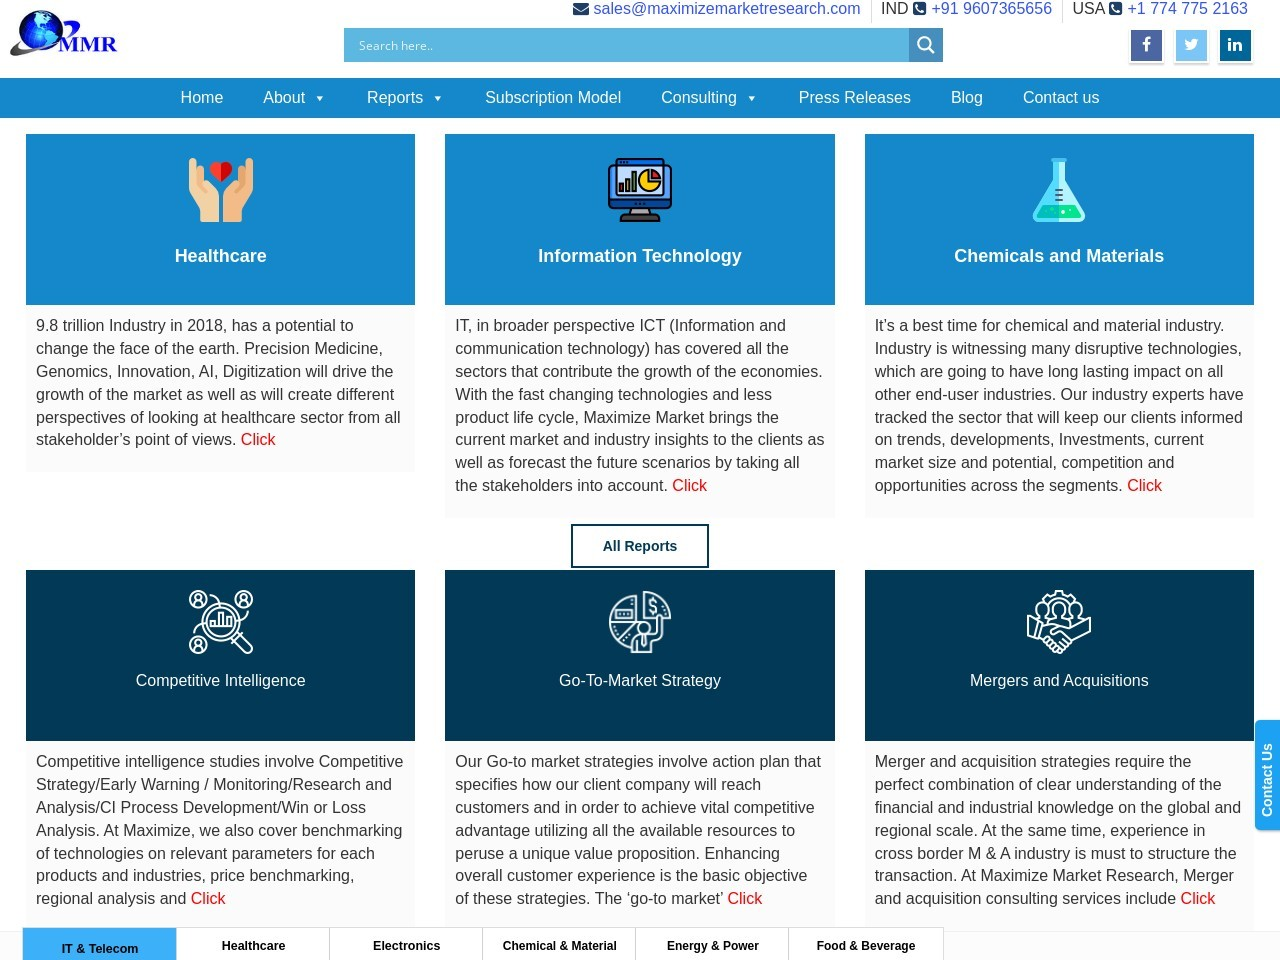 Global Online Book Services Market